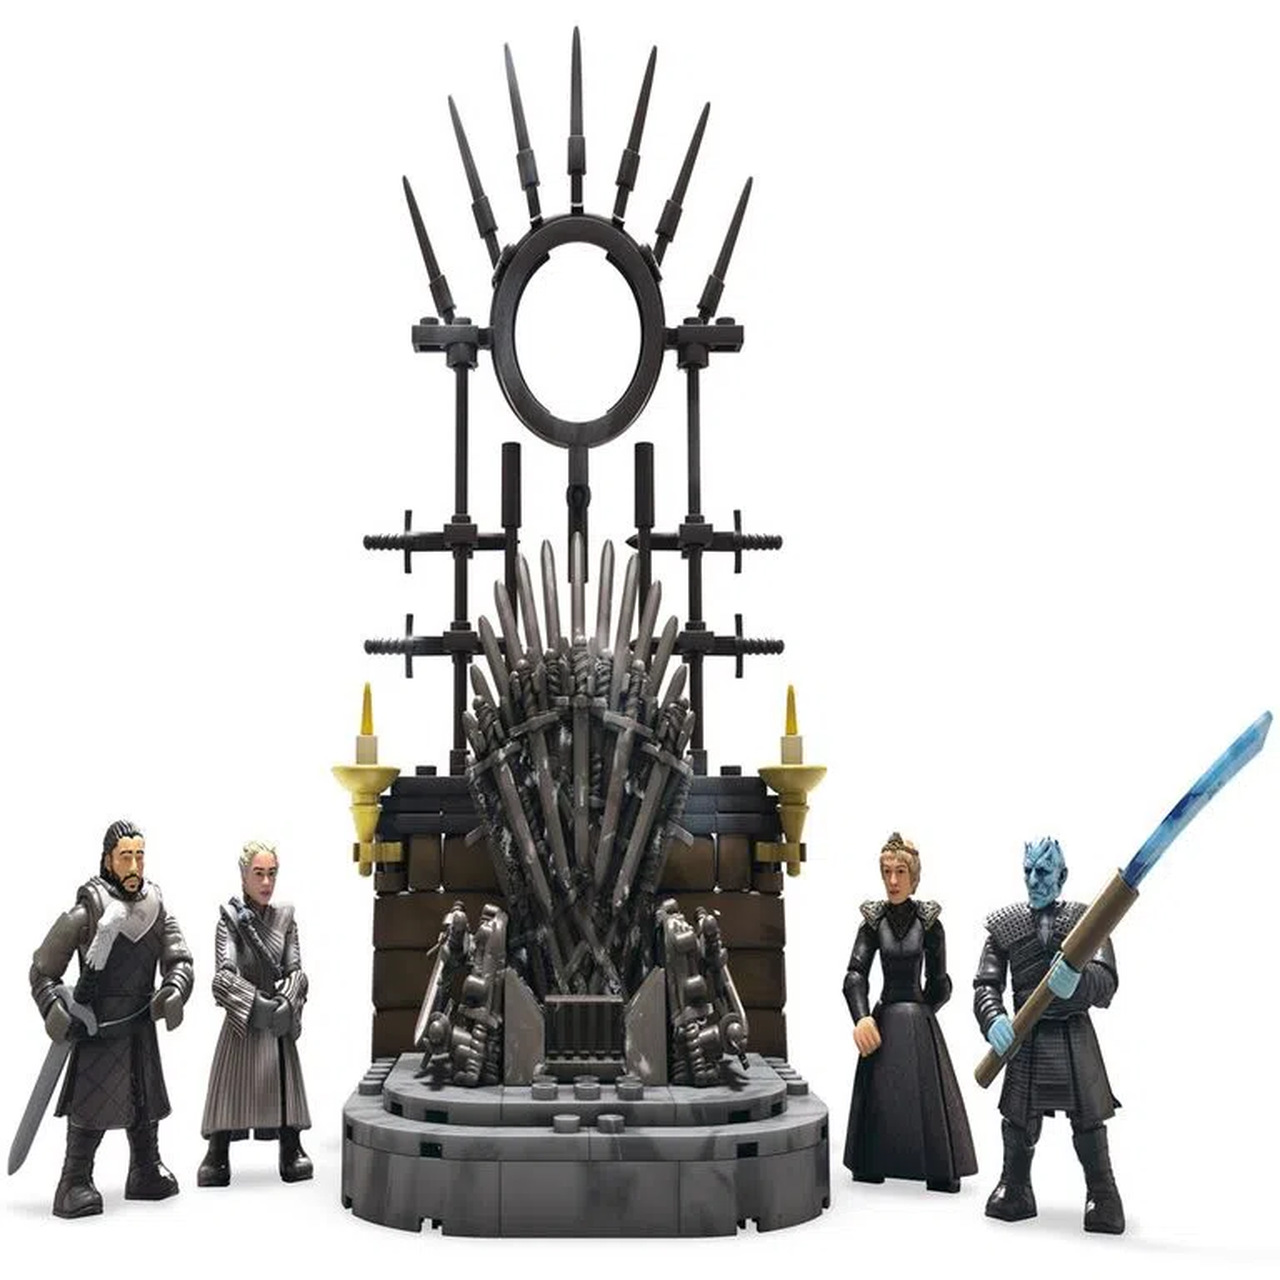 Bloco de Montar Trono de Ferro: Mega Construx Black Series Game Of Thrones - Mattel